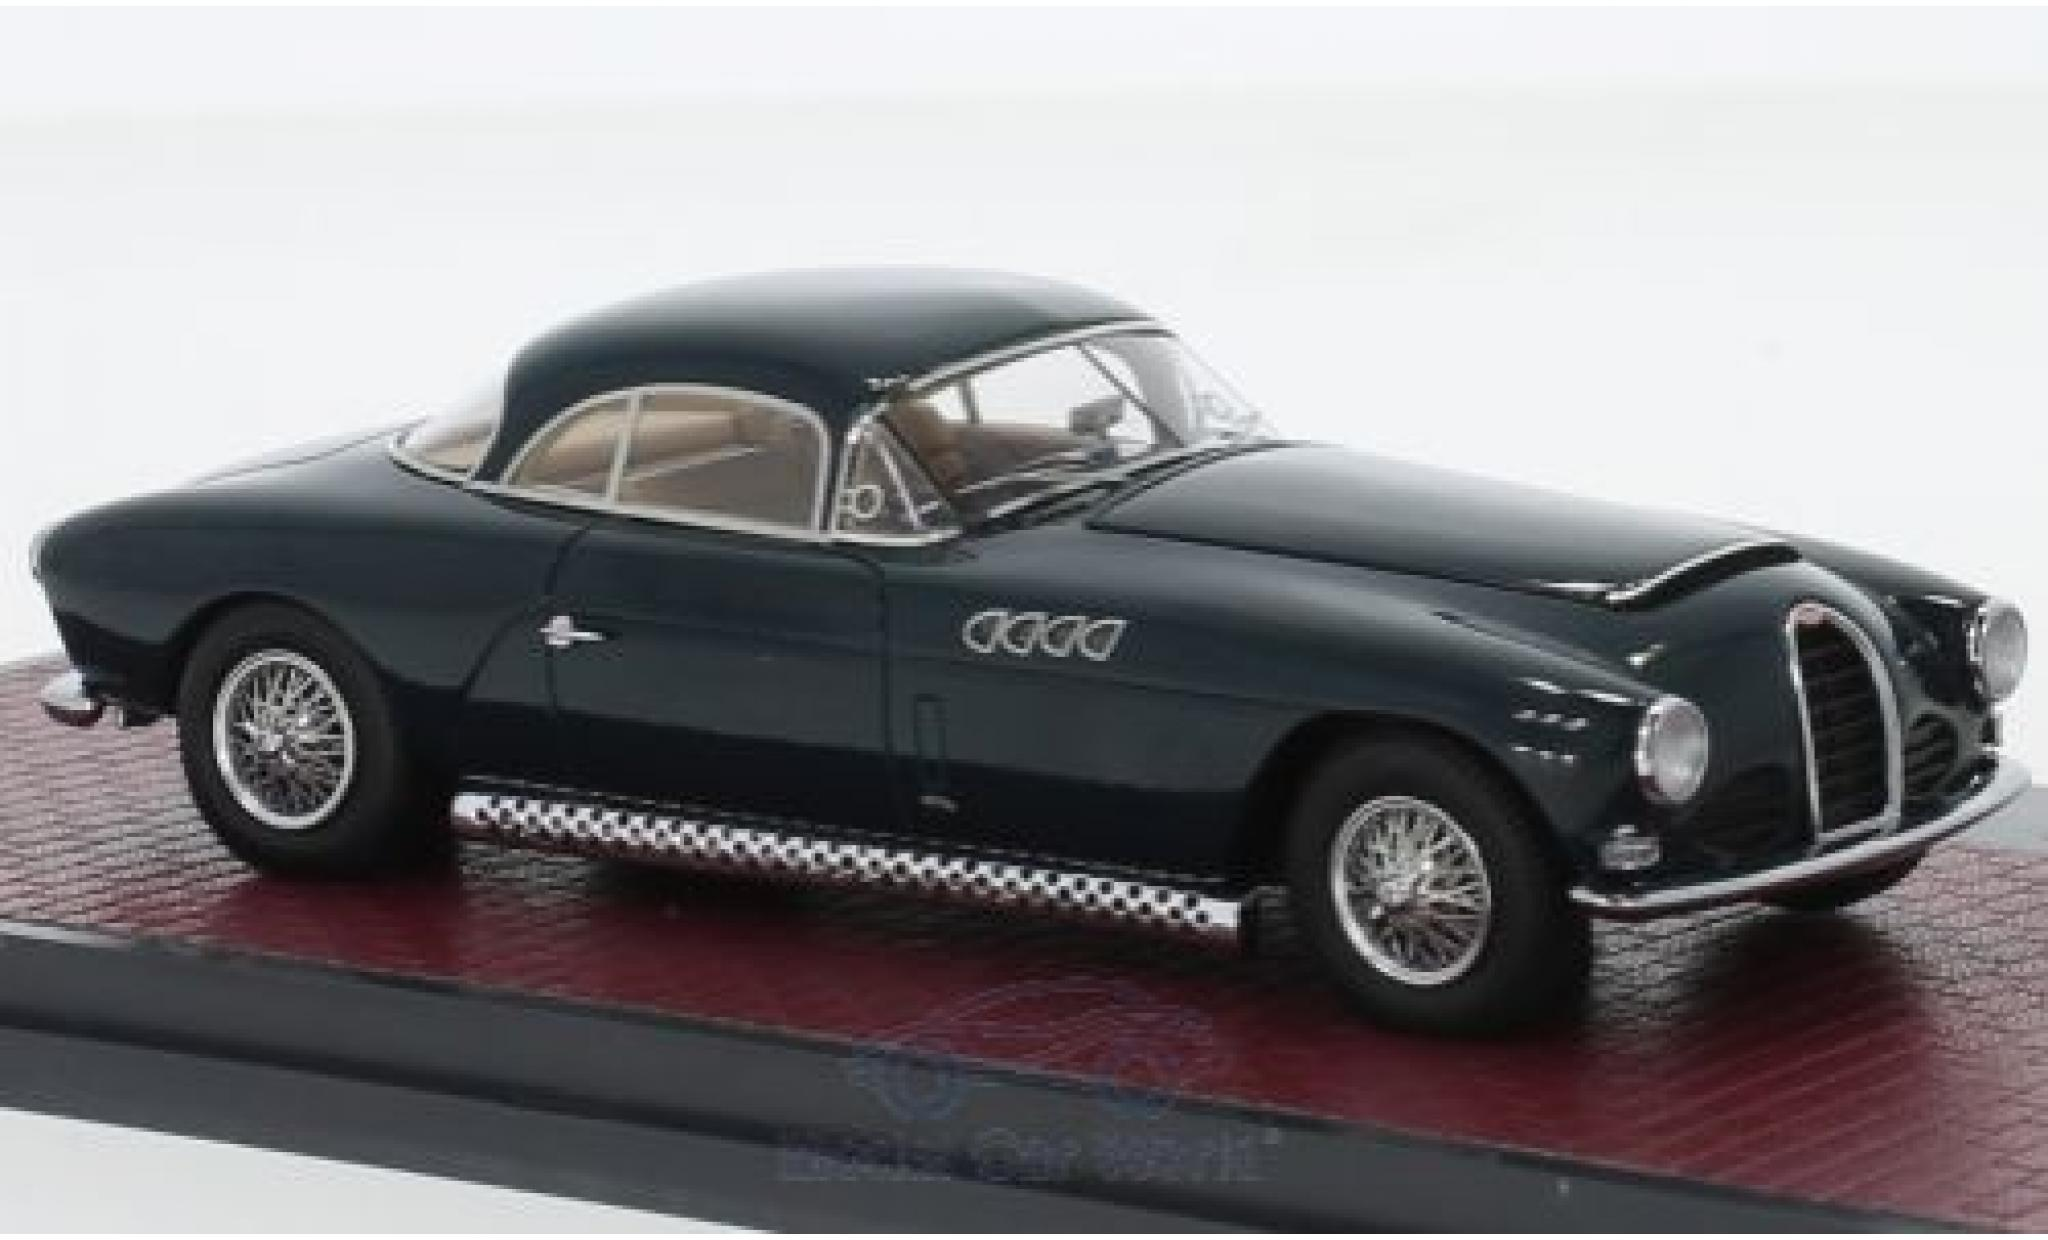 Bugatti Type 101 1/43 Matrix Antem Coupe verte RHD 1951 Chassis 101504